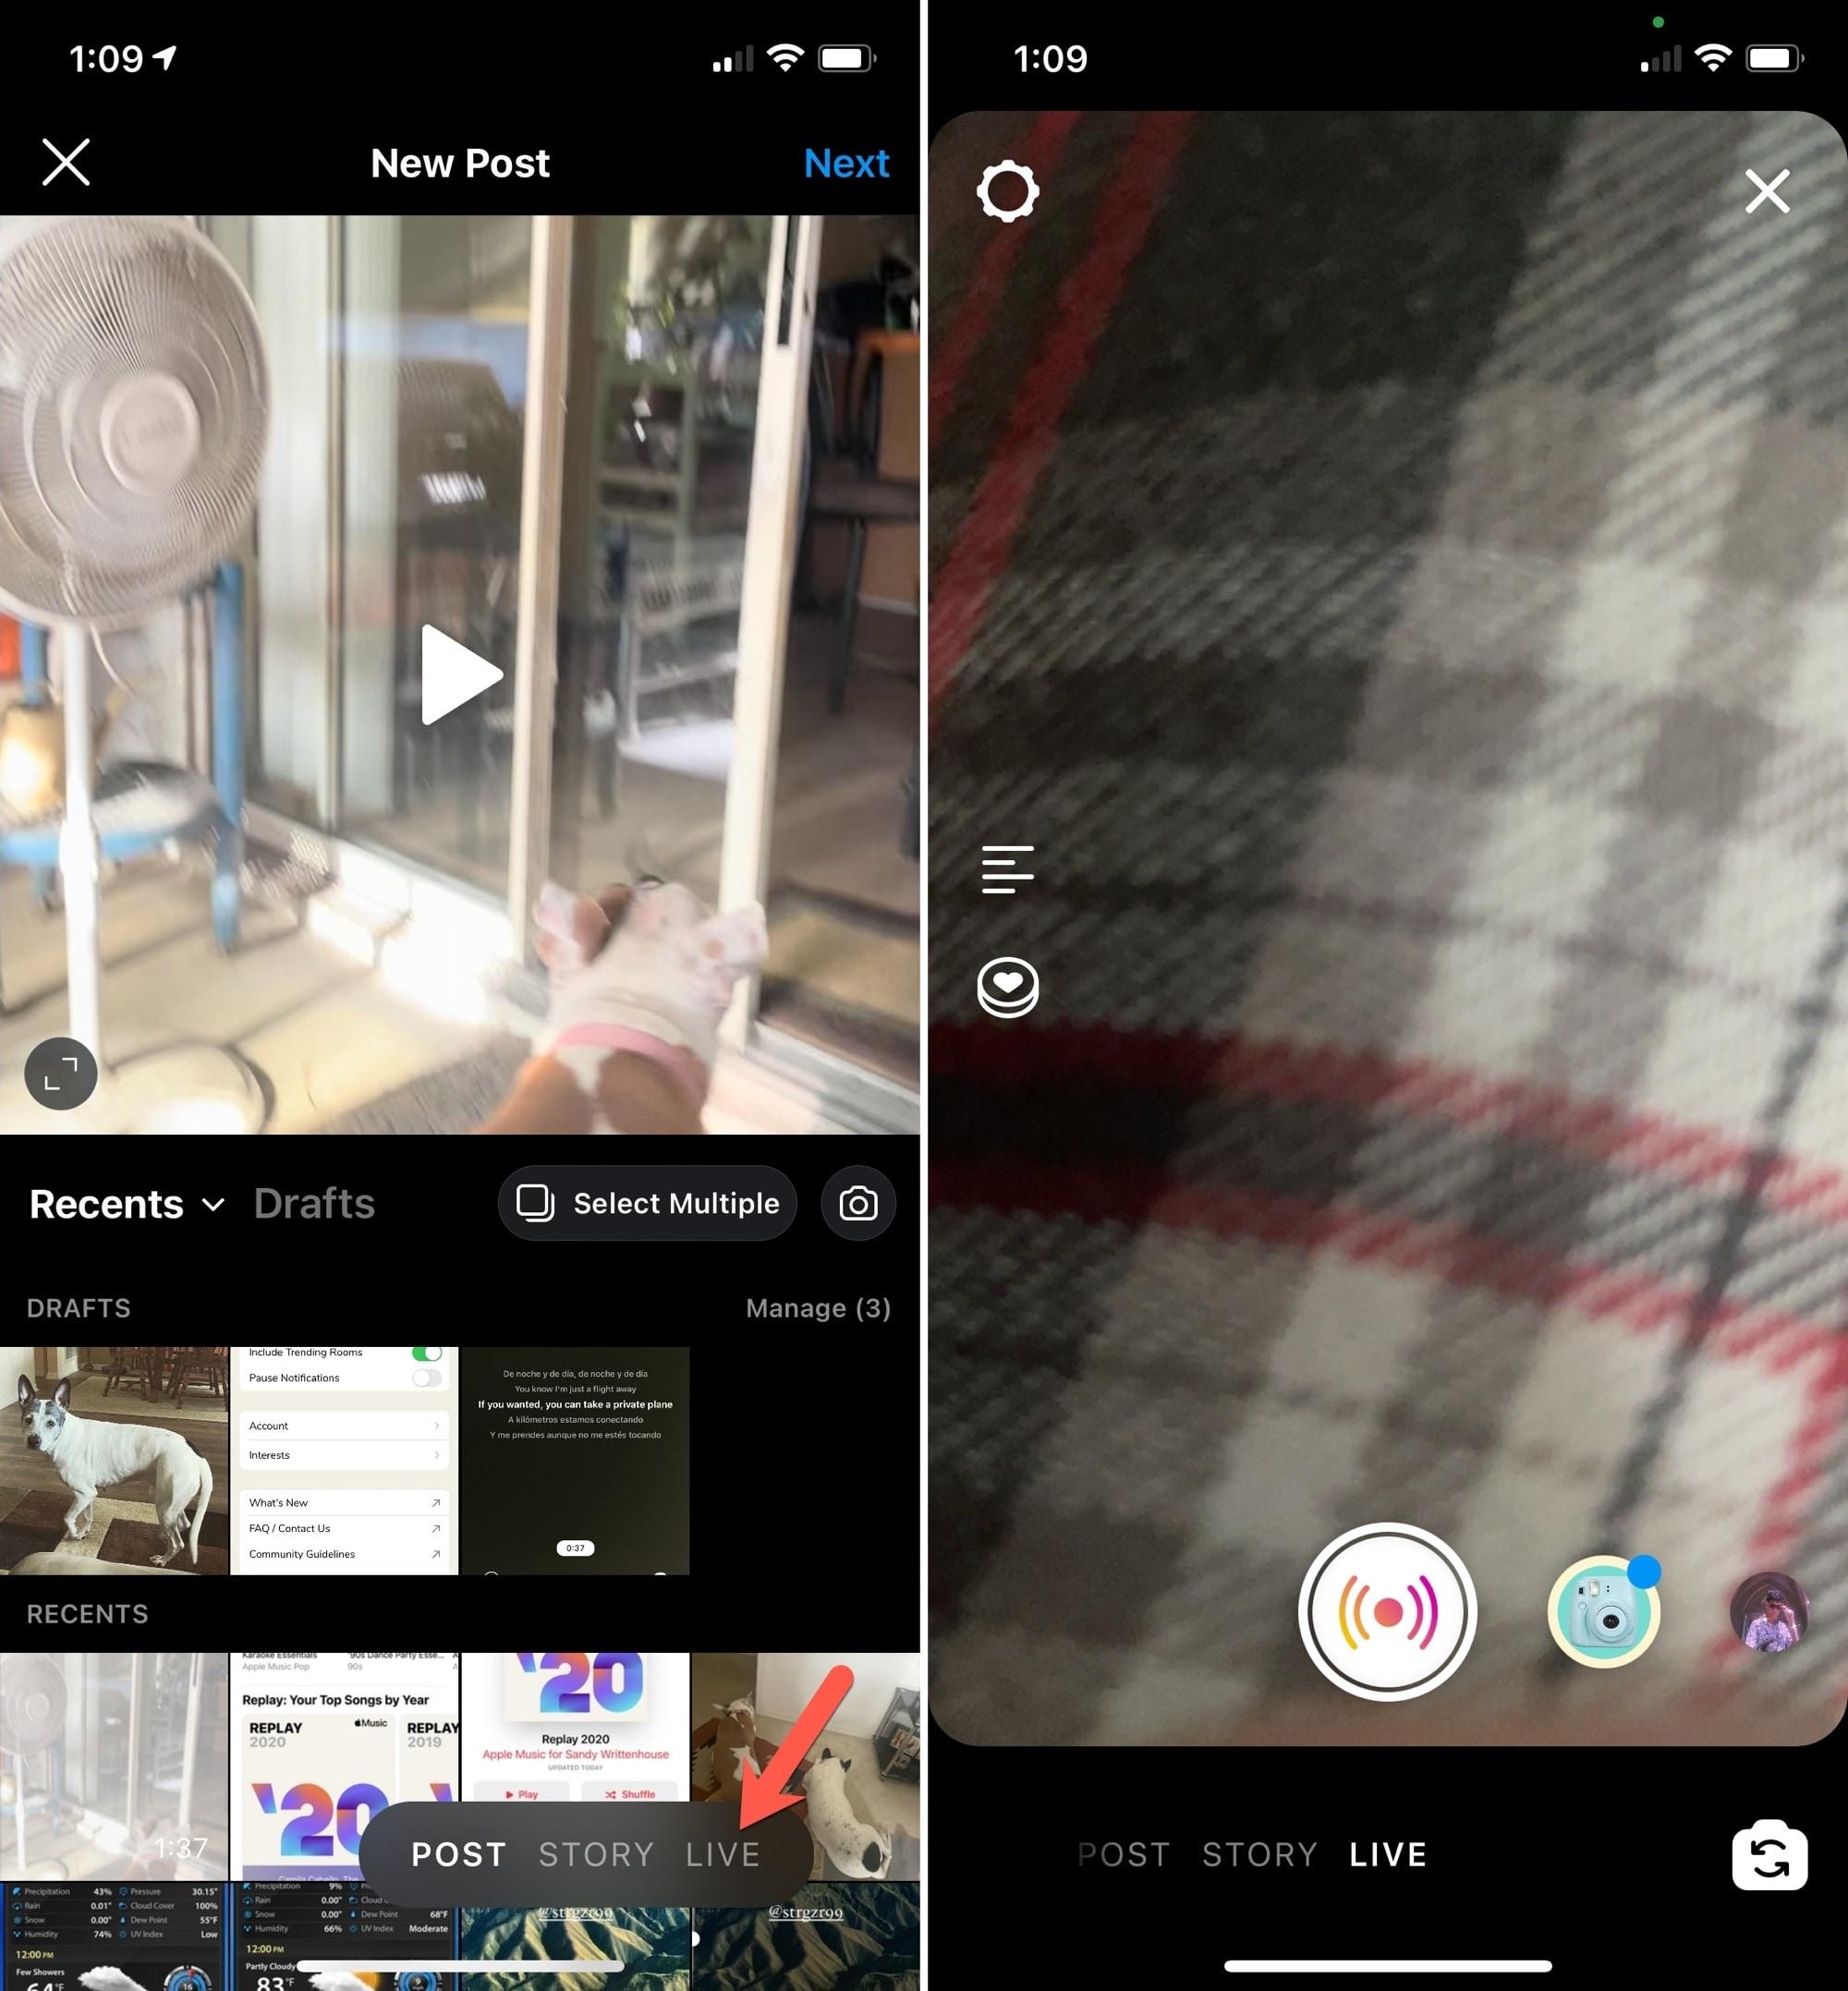 Start Live Broadcast on Instagram